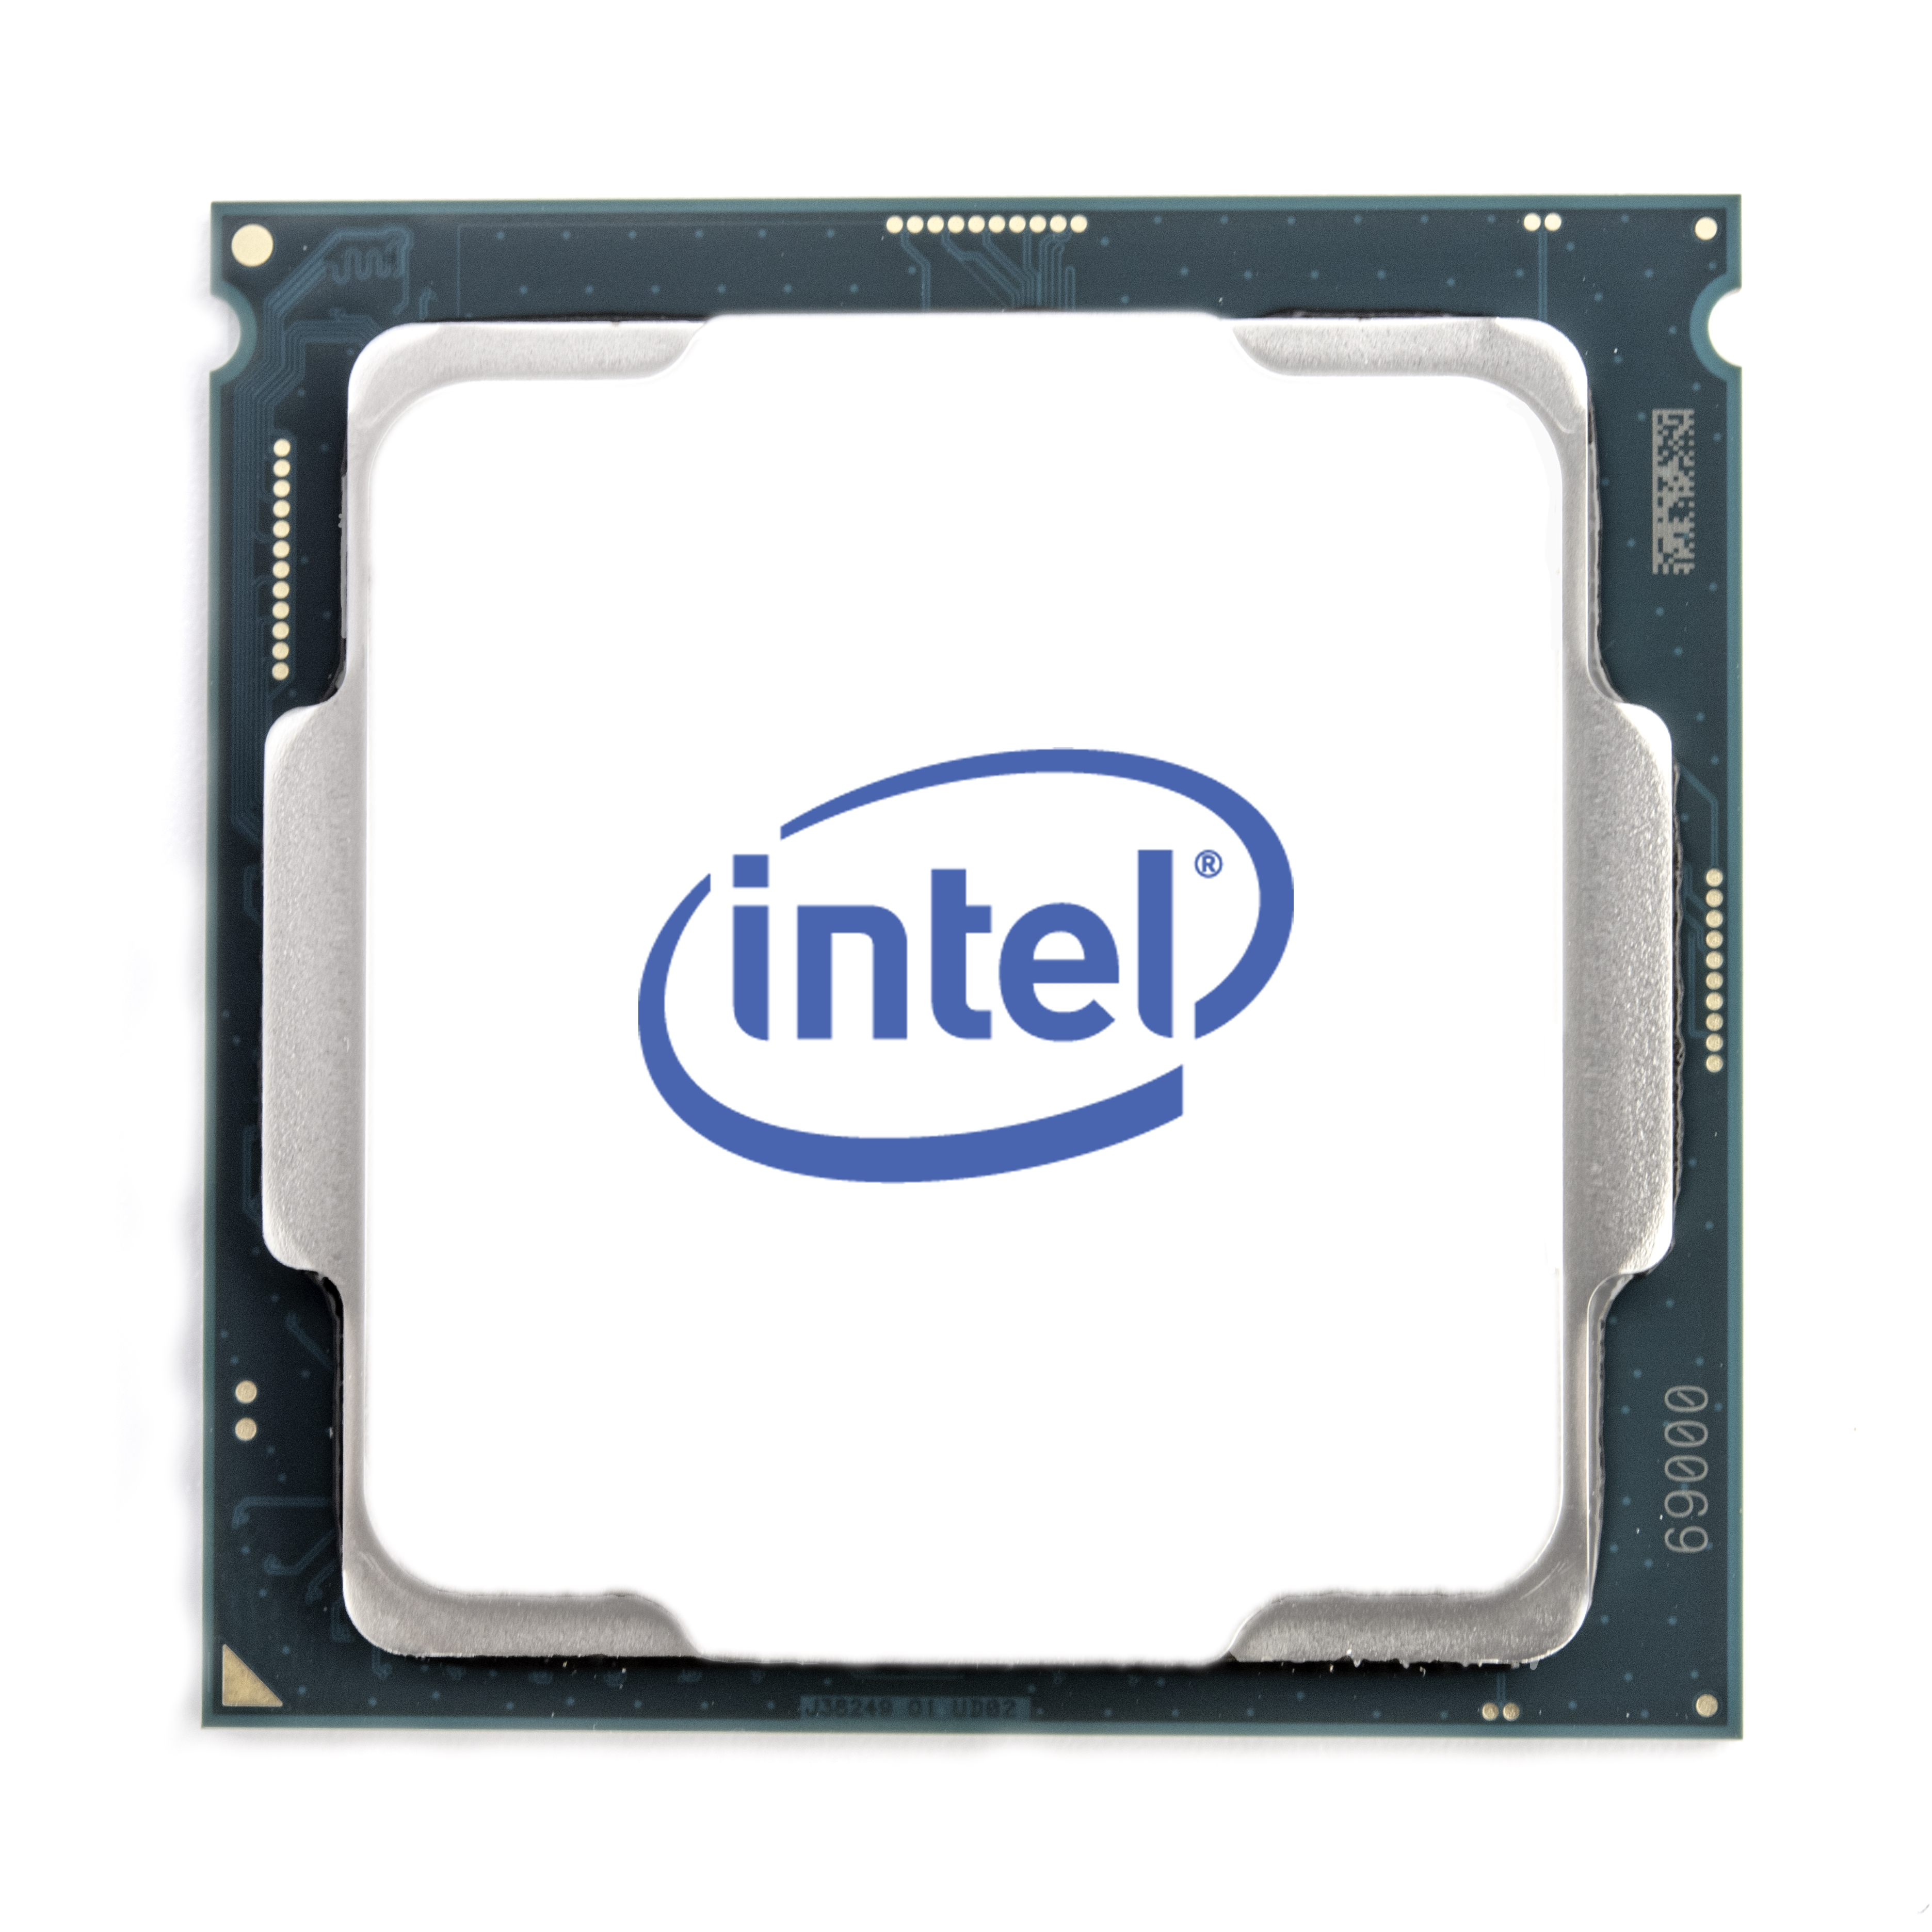 Intel Xeon E-2236 - 3.4 GHz - 6 Kerne - 12 Threads